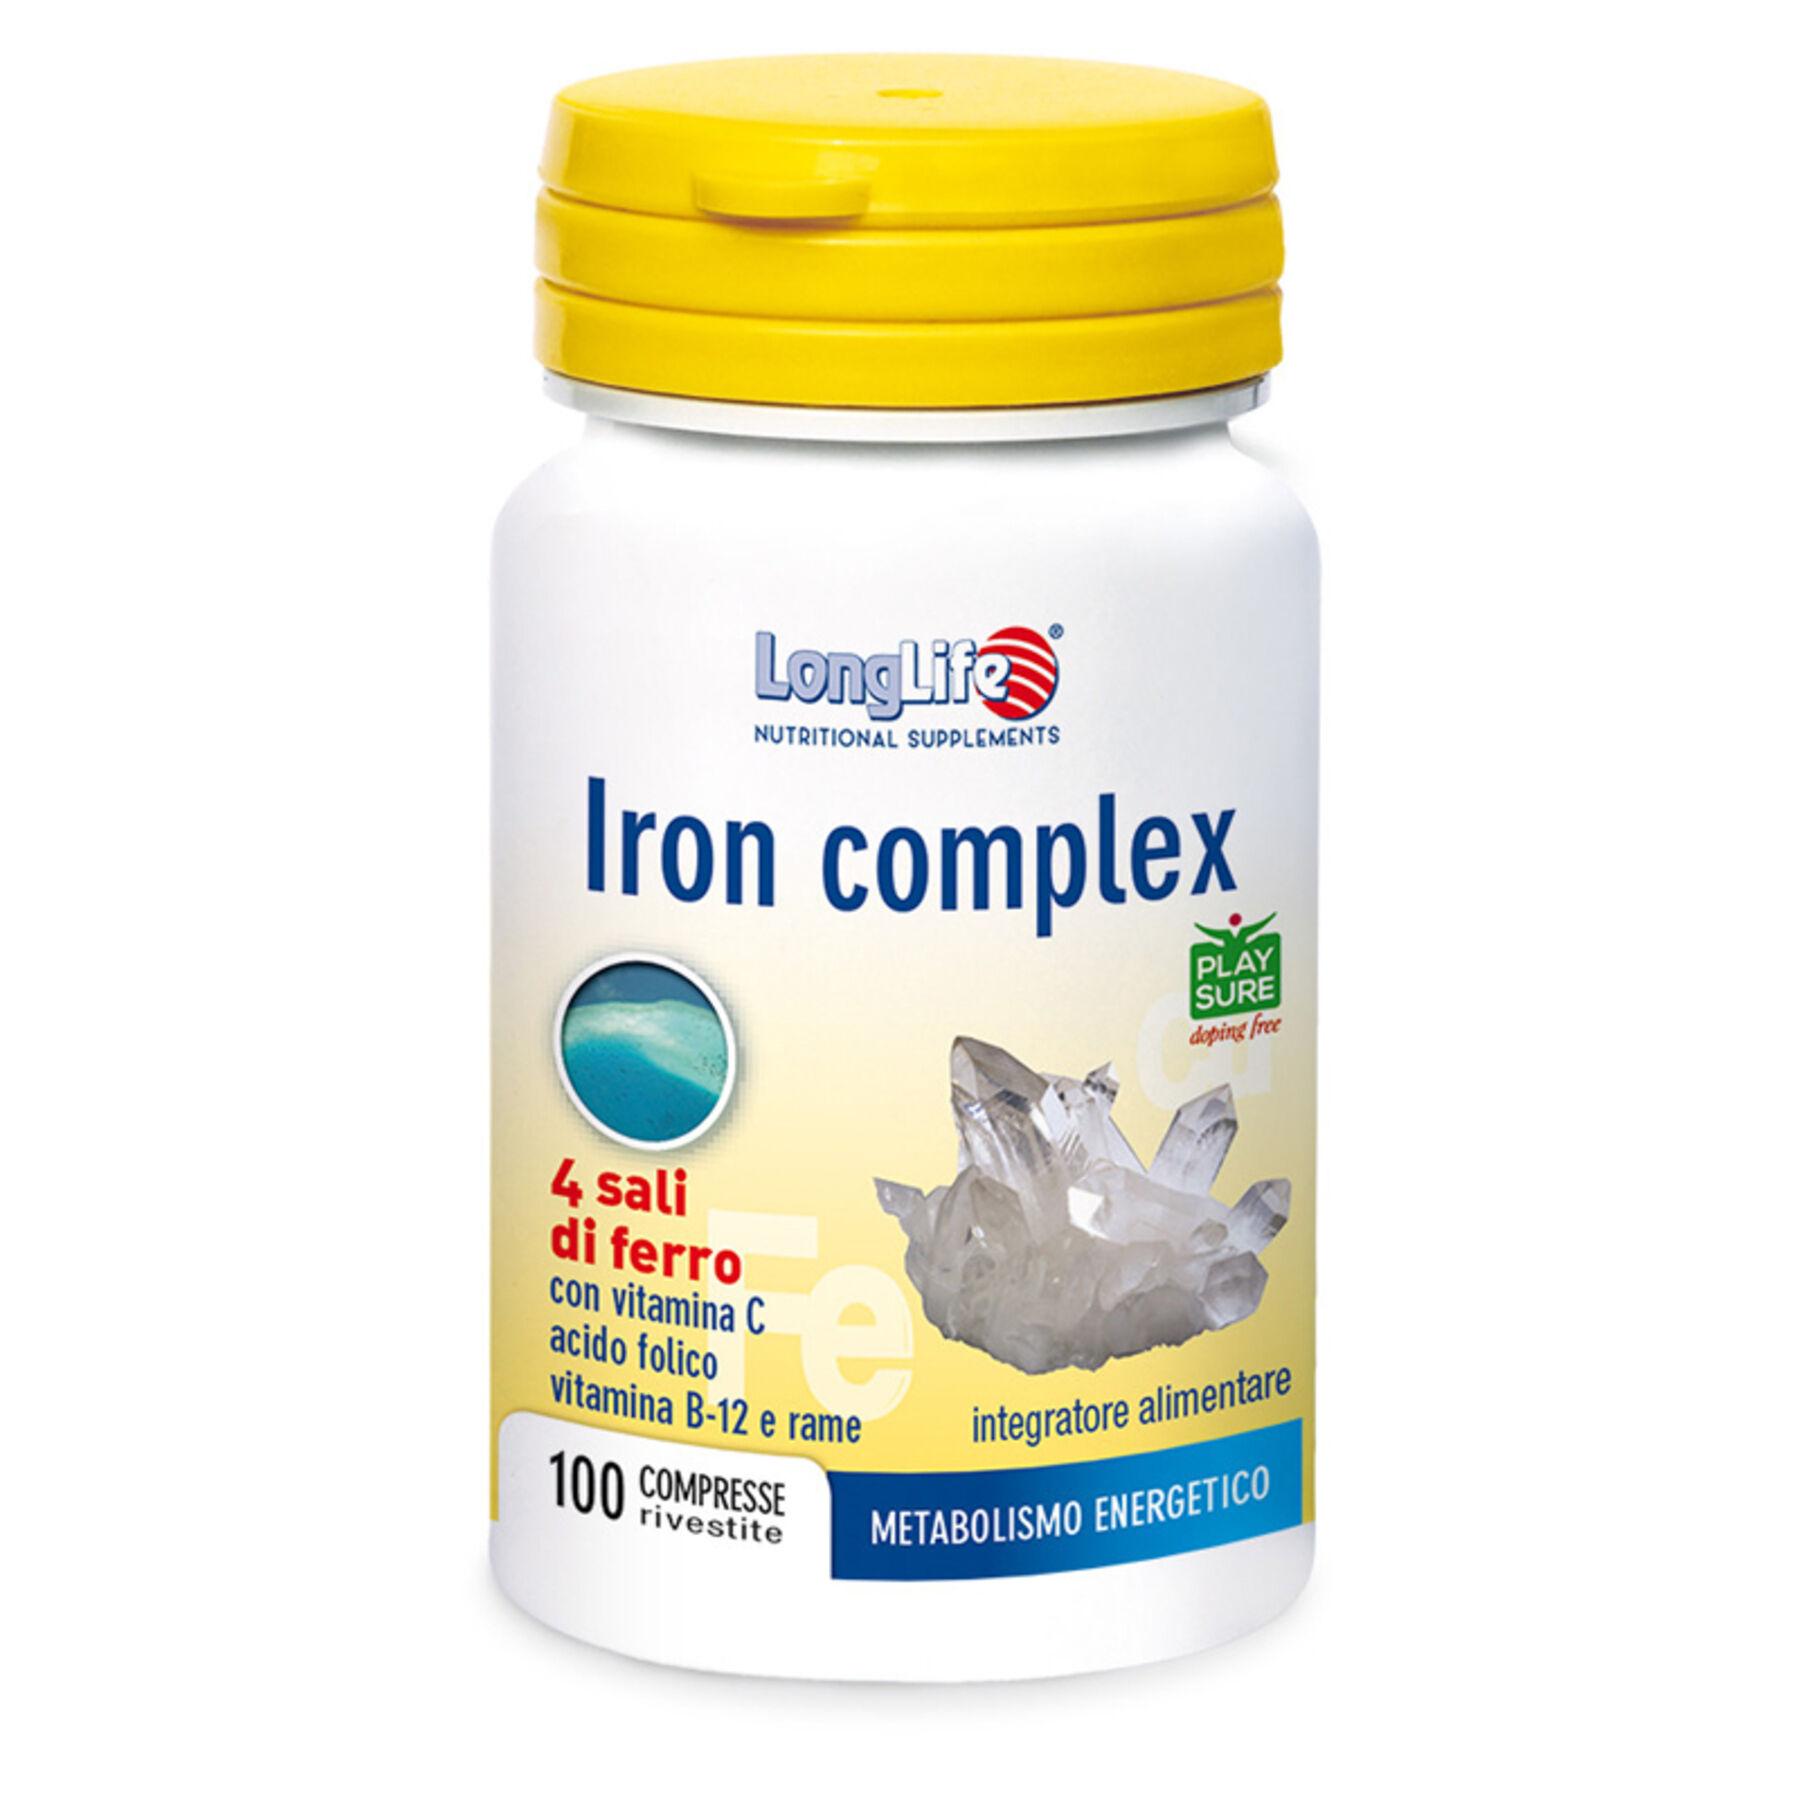 Phoenix Longlife iron complex 100 compresse